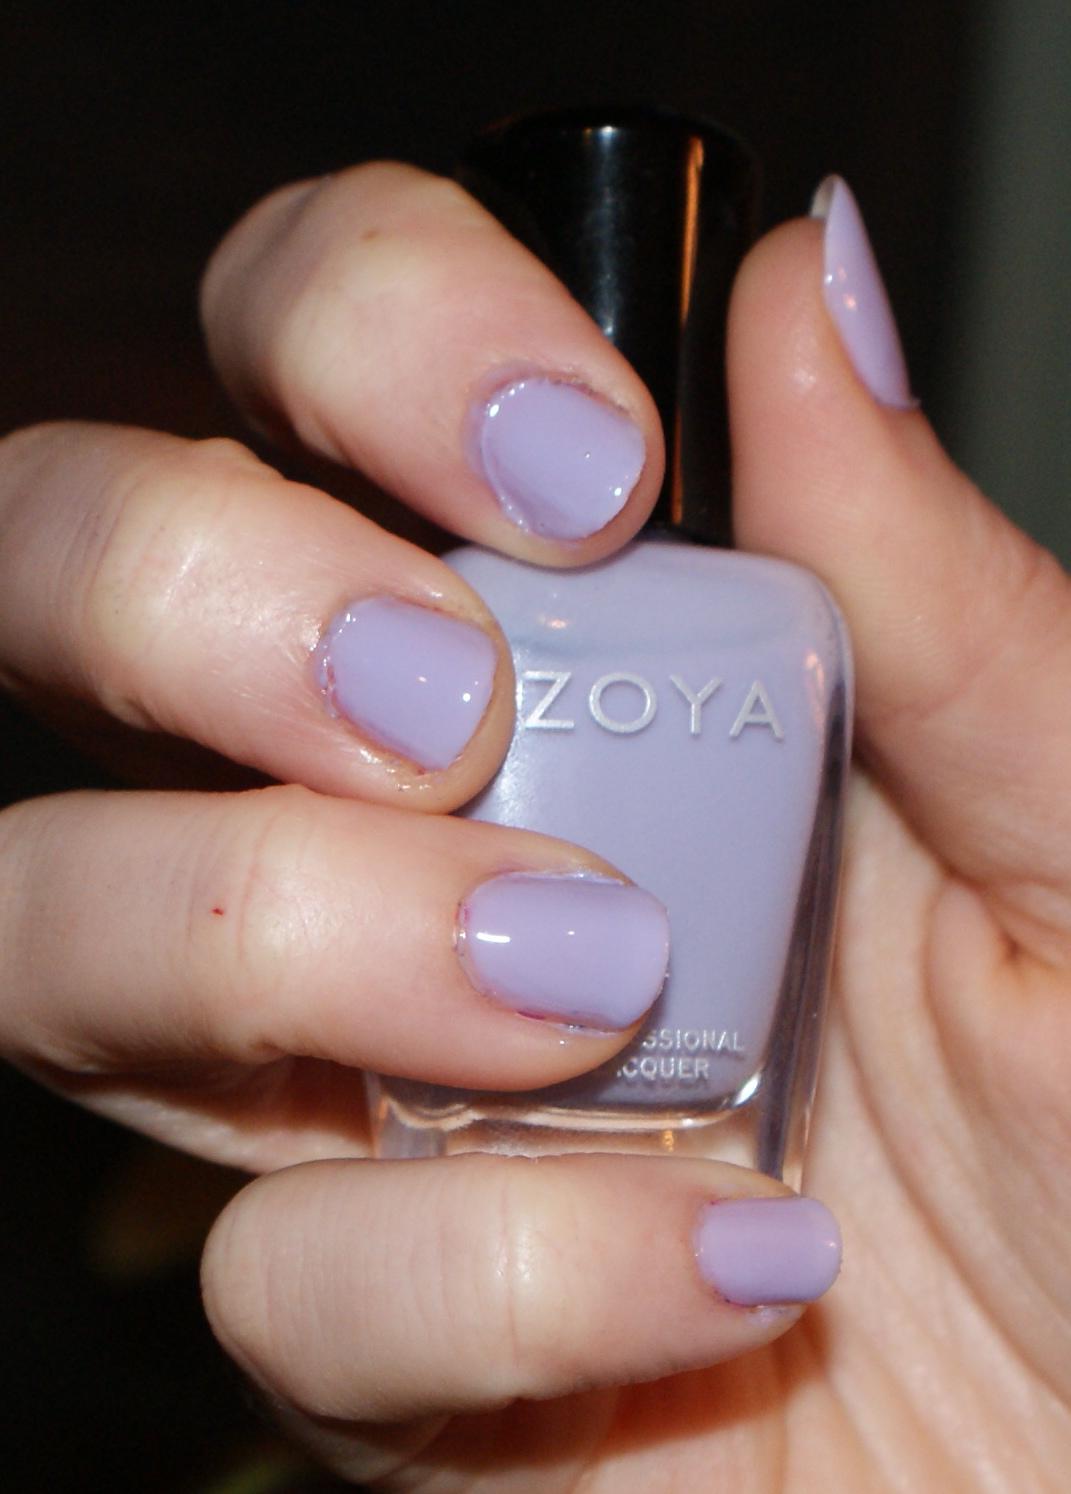 Zoya miley